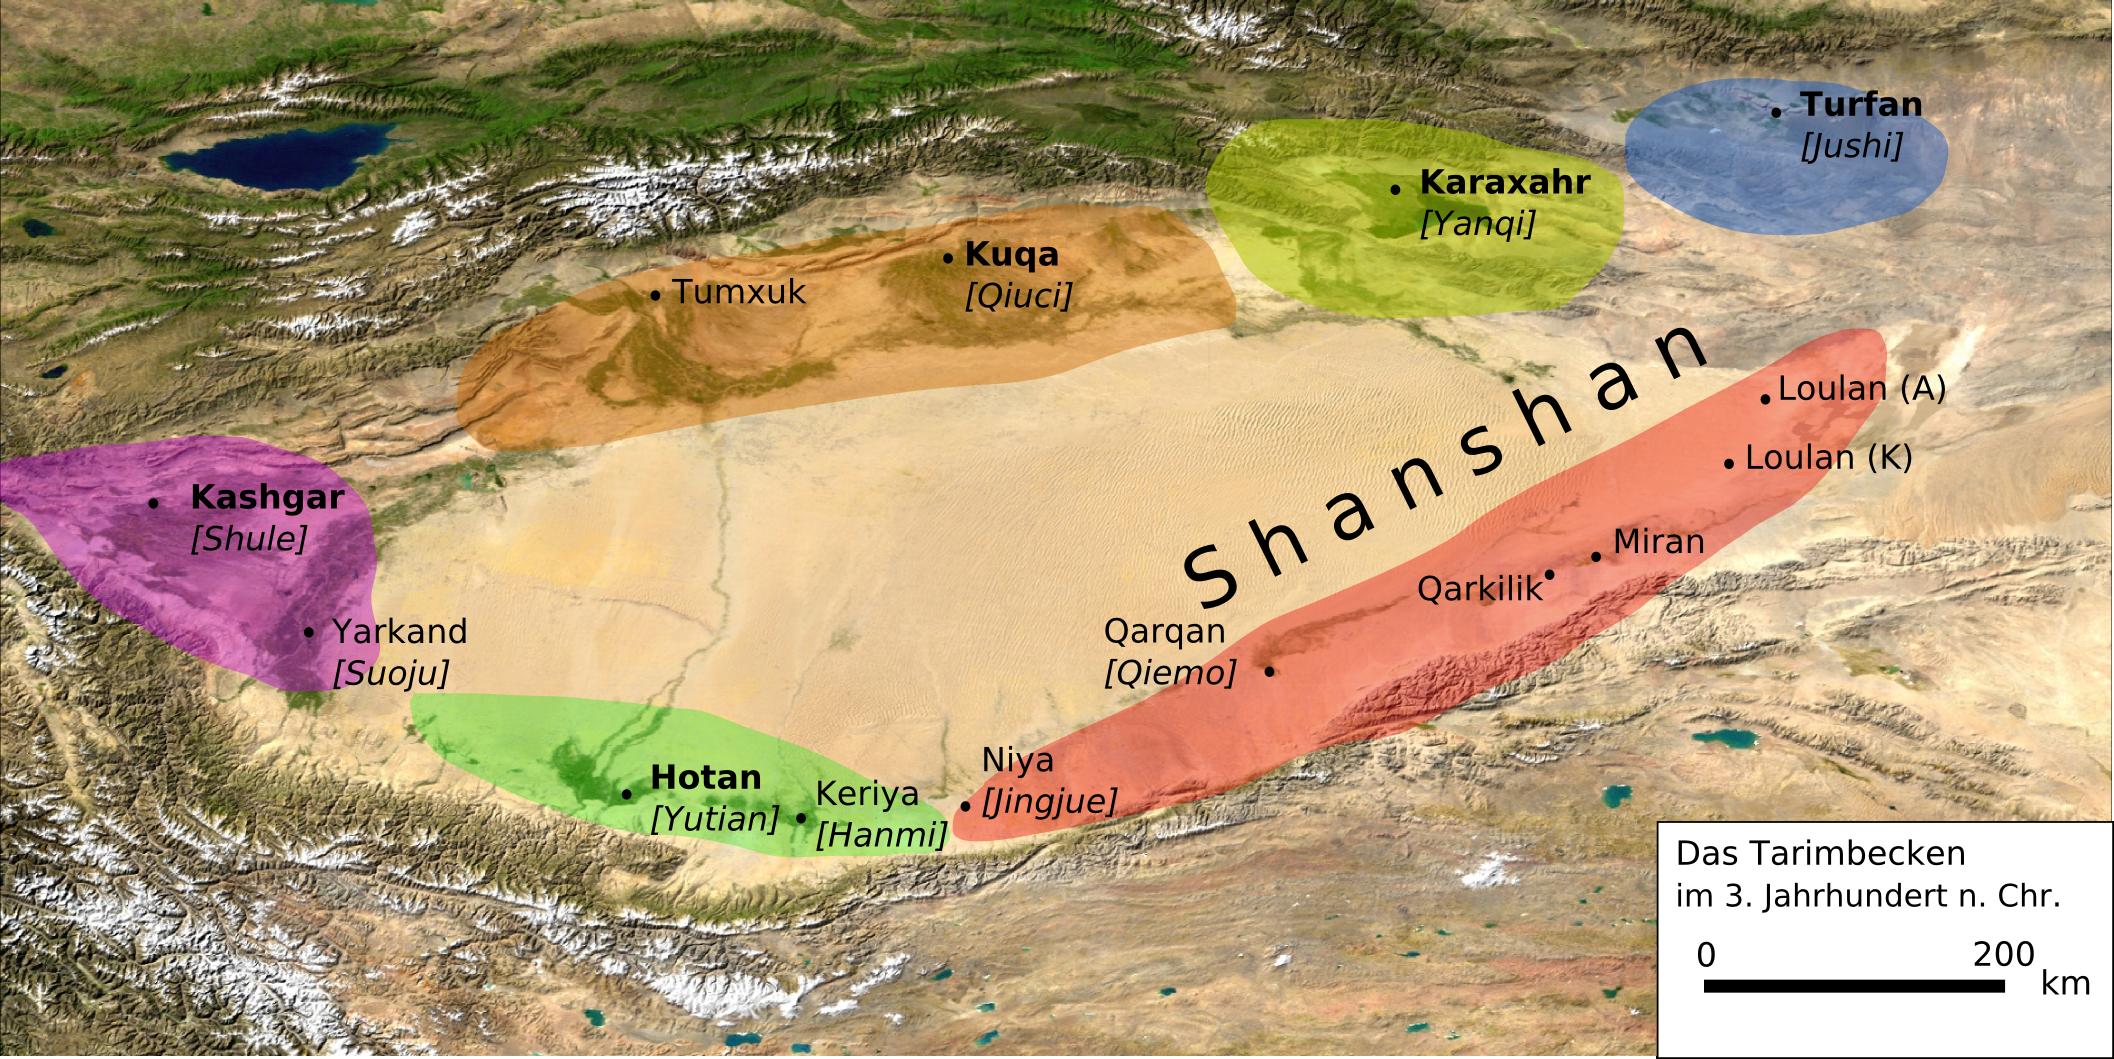 The Tarim Basin in the 3rd century CE.